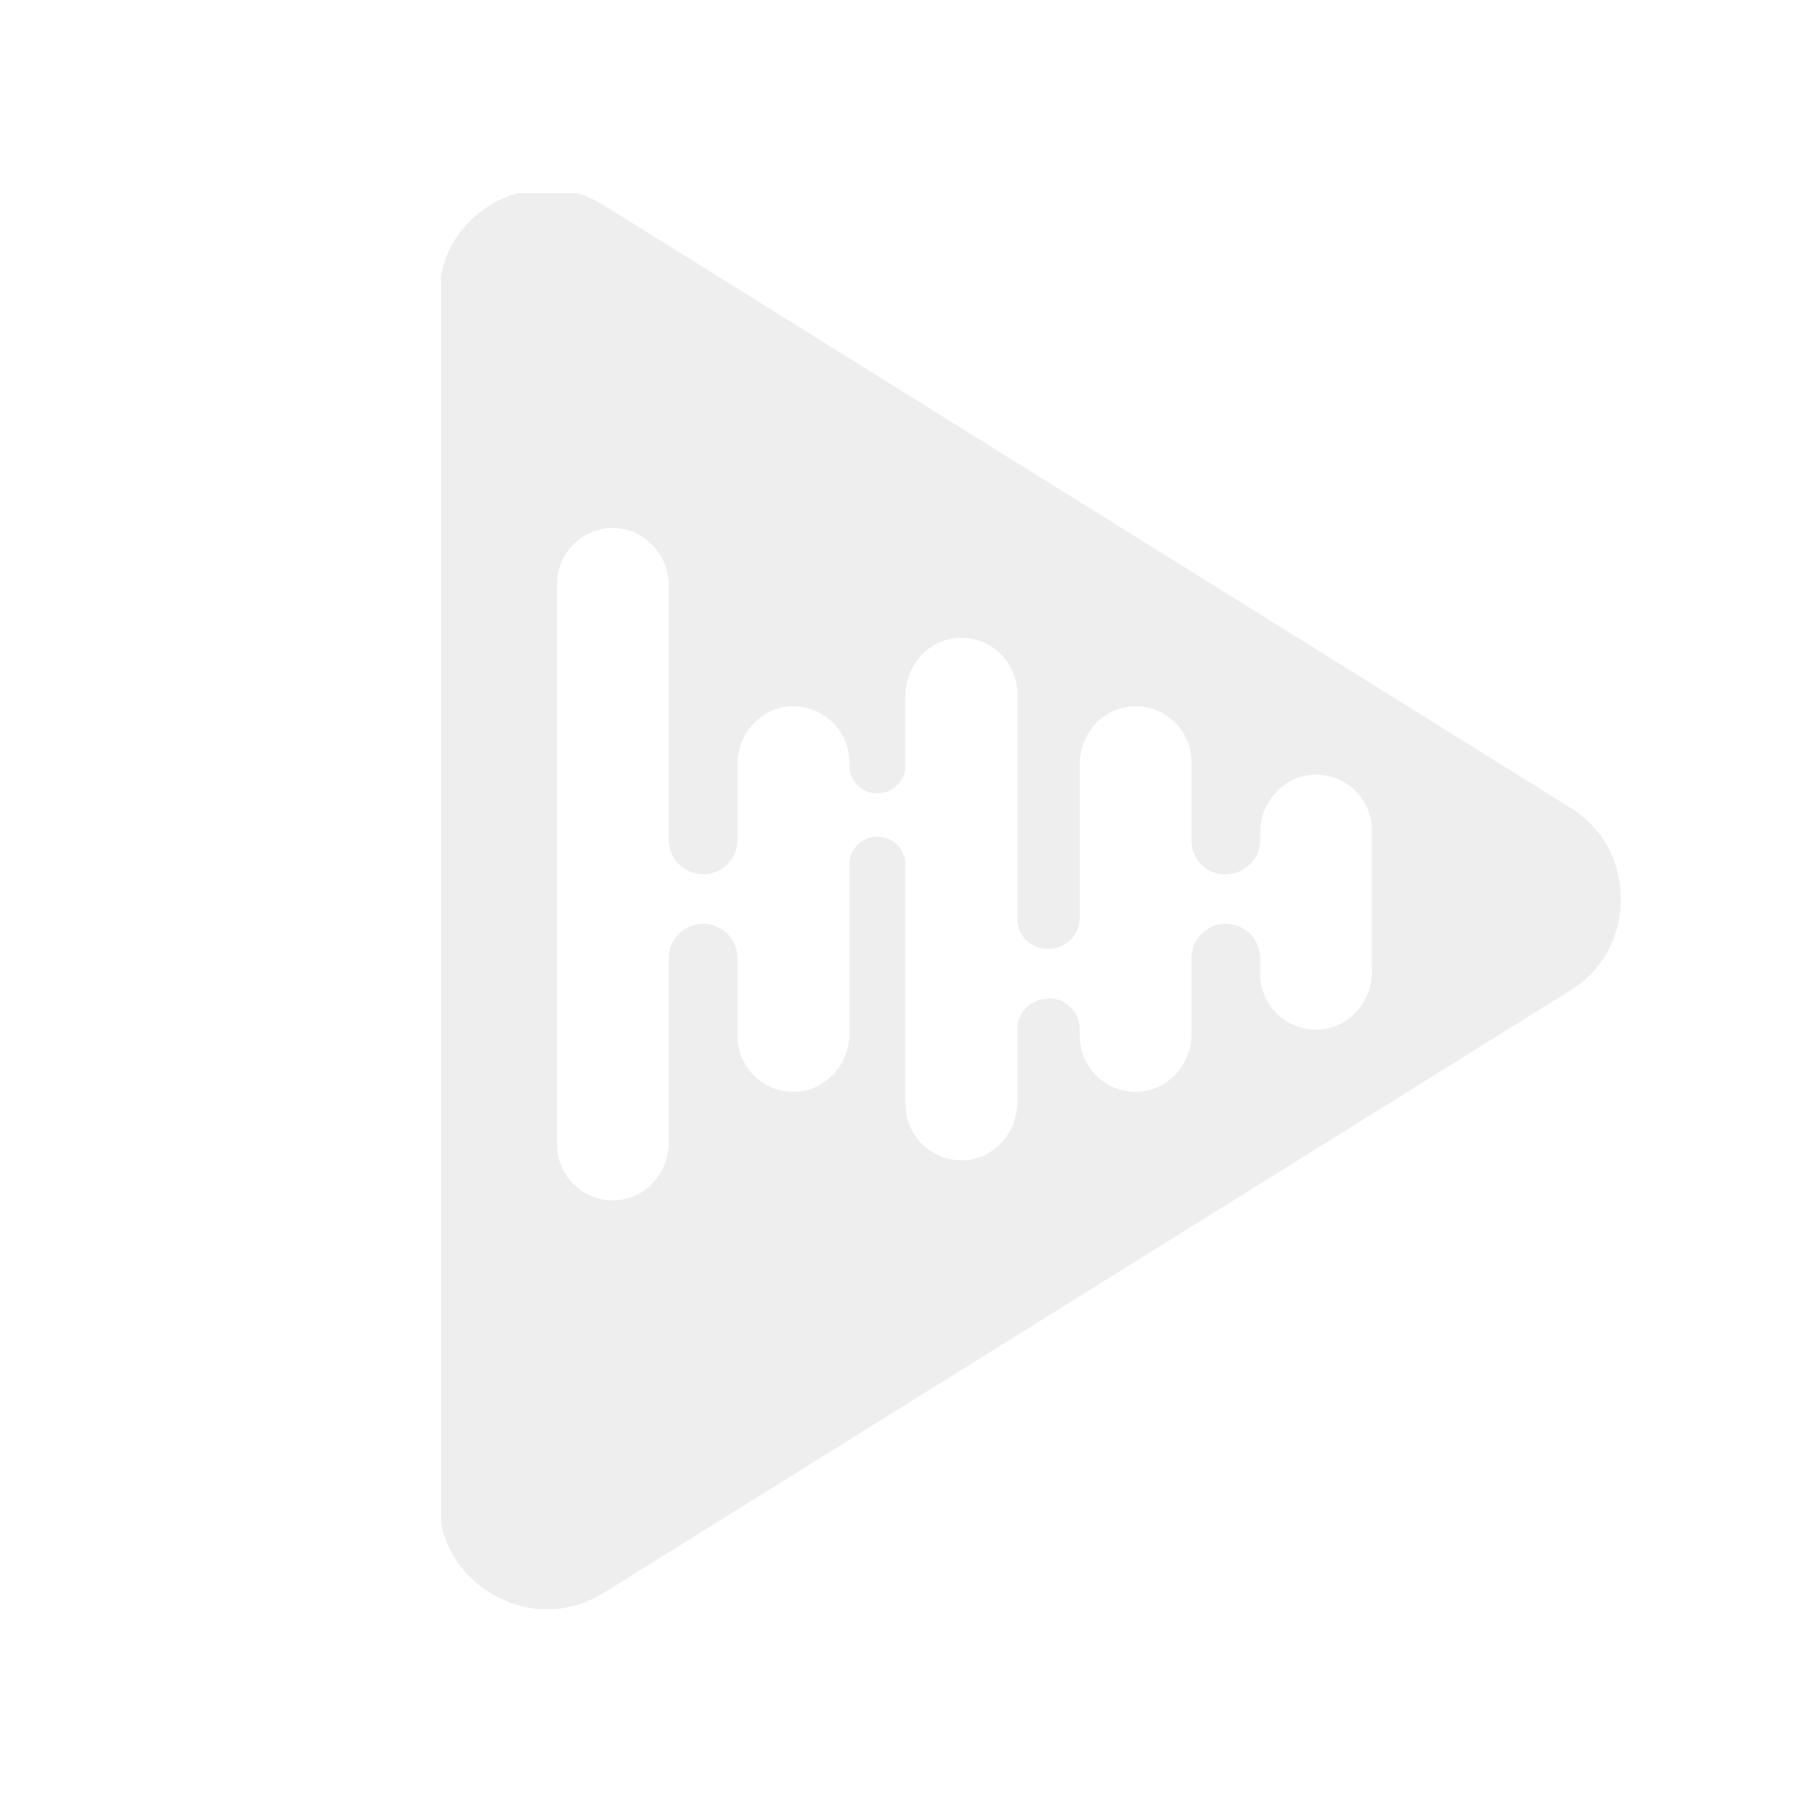 Audison APBMW BIAMP 2